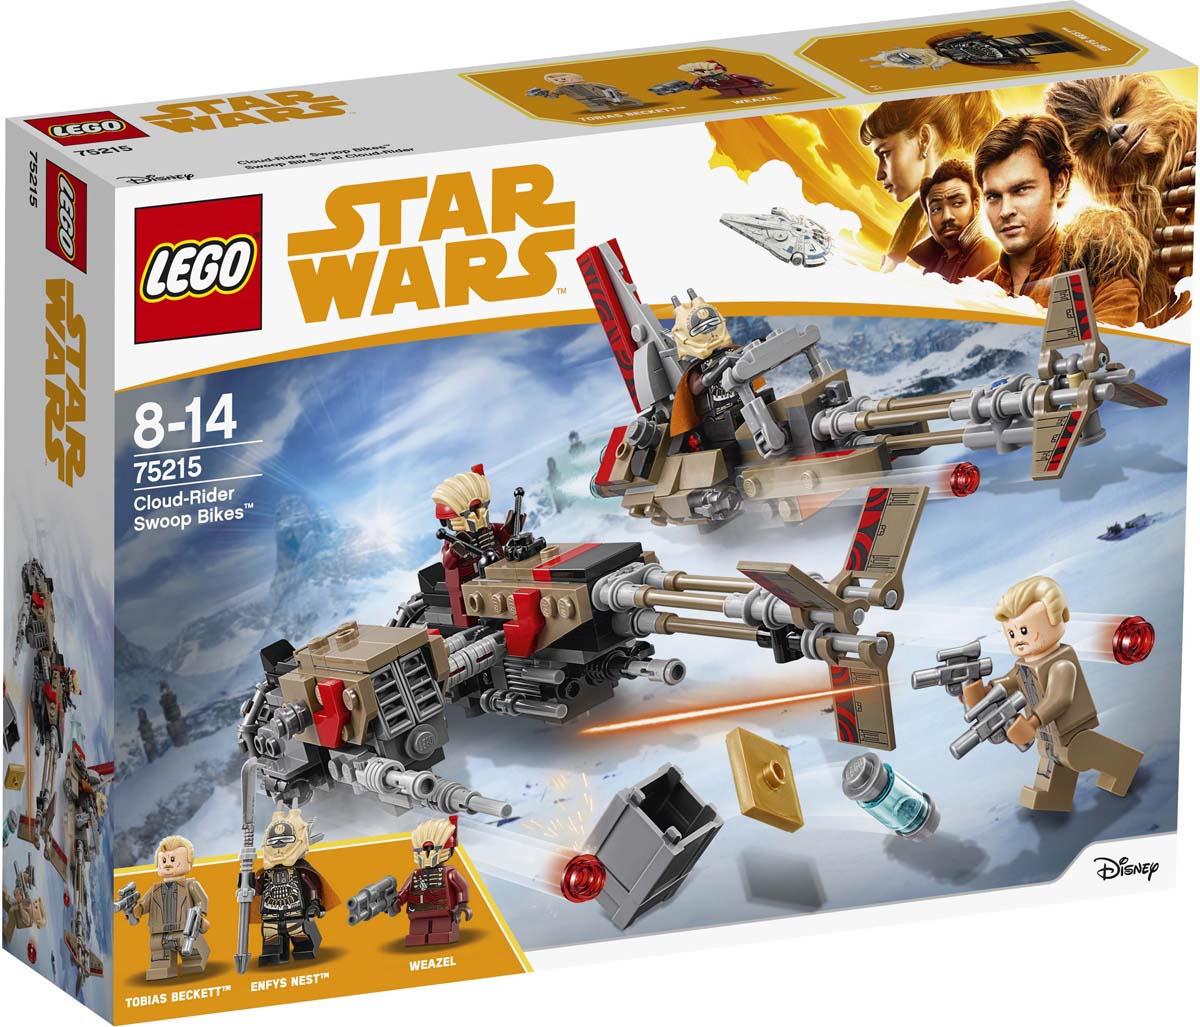 LEGO Star Wars 75215 Свуп-байки Конструктор